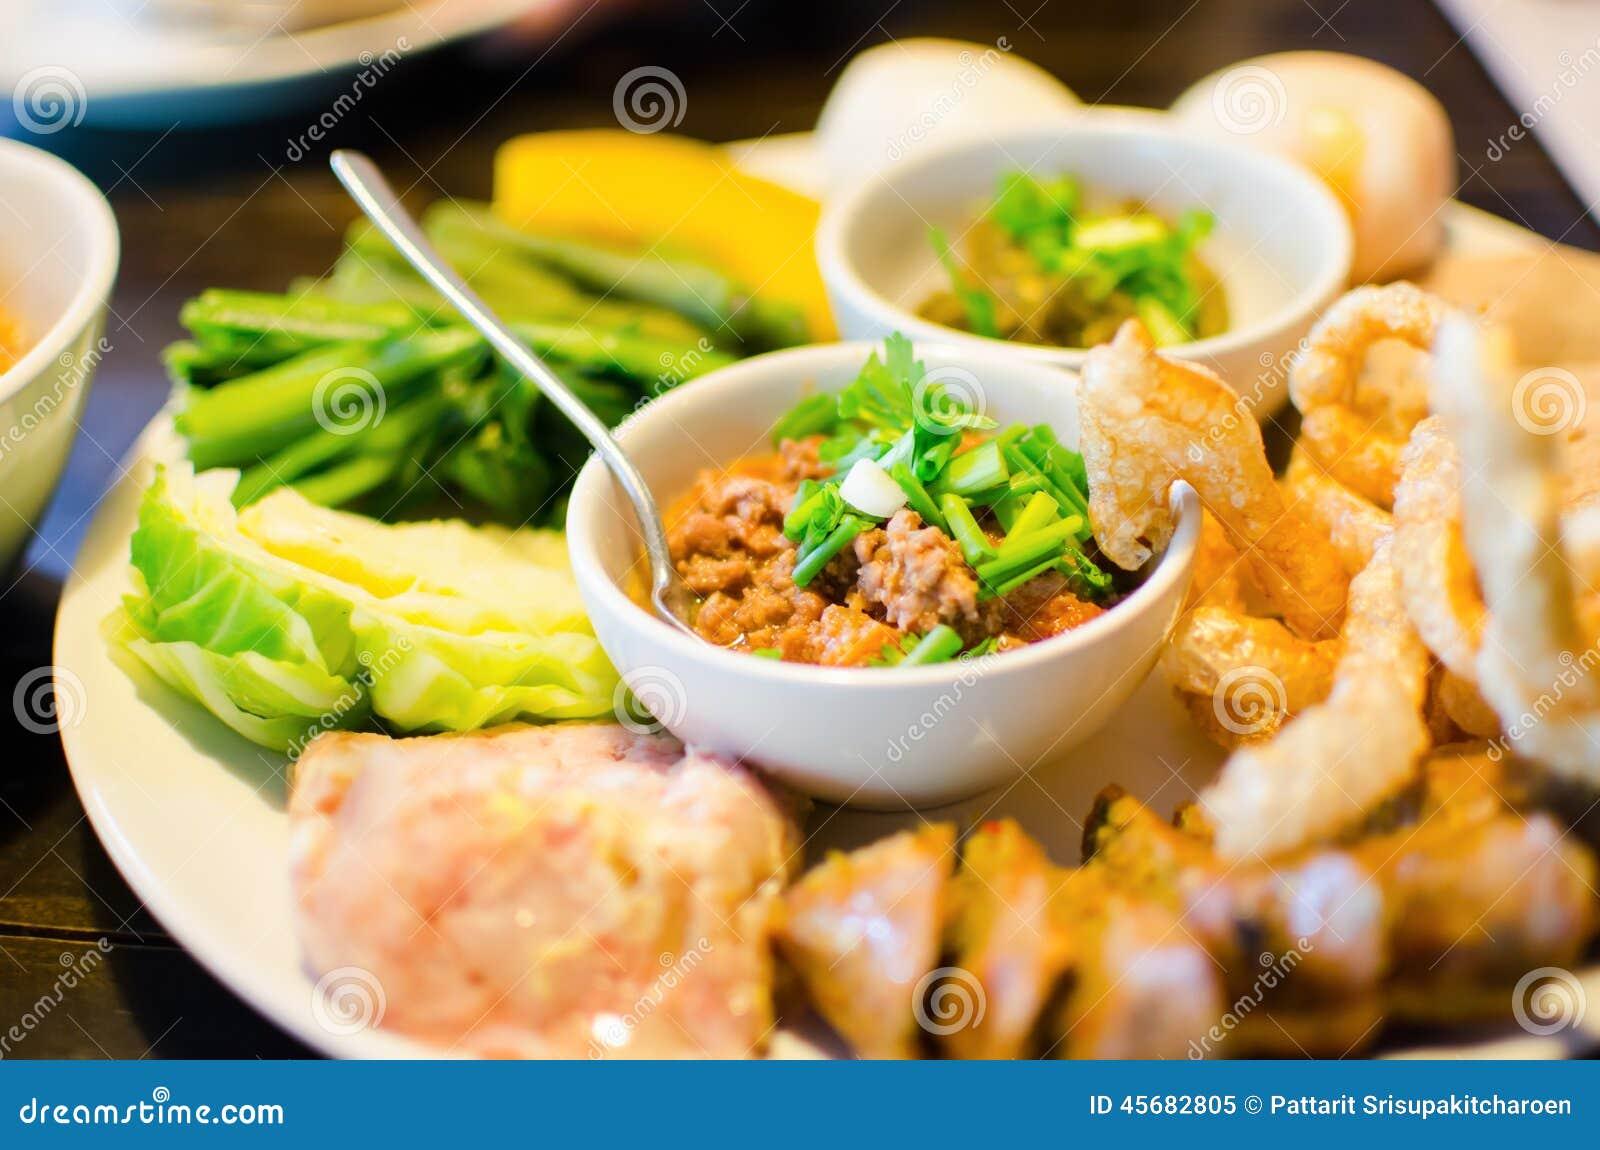 Thai Northern Style Pork and Tomato Relish